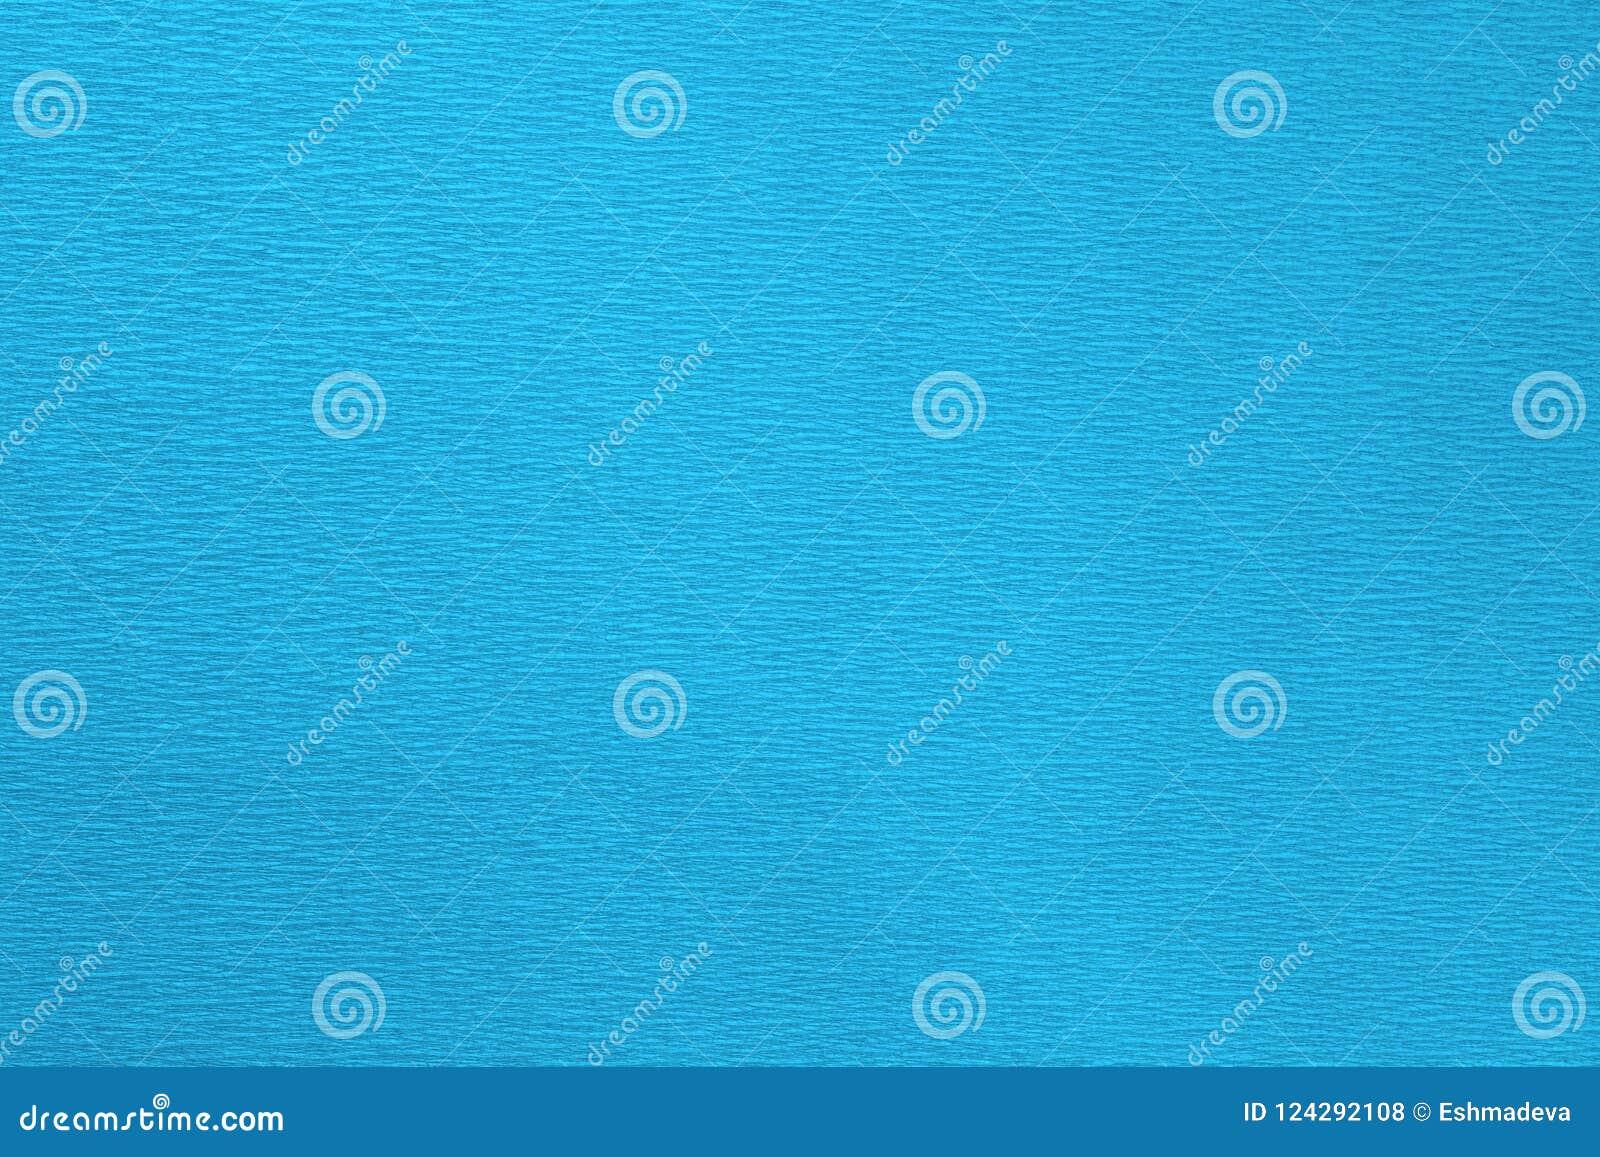 Fundo textured abstrato ciano pastel